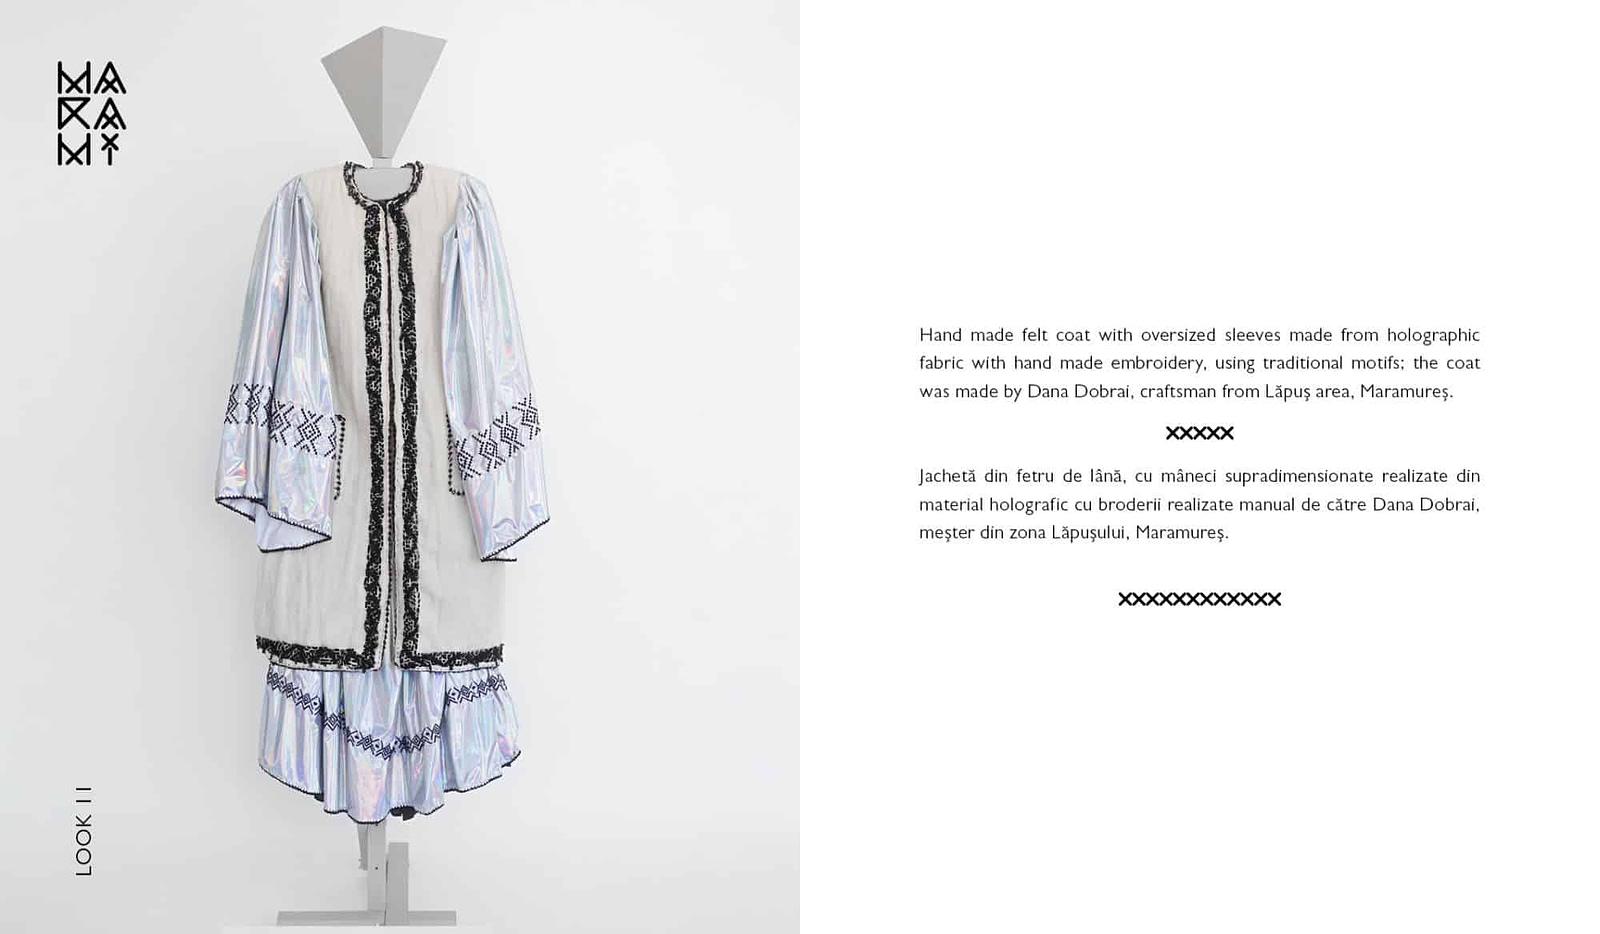 lookbook, design, publishing design, Ma Ra Mi